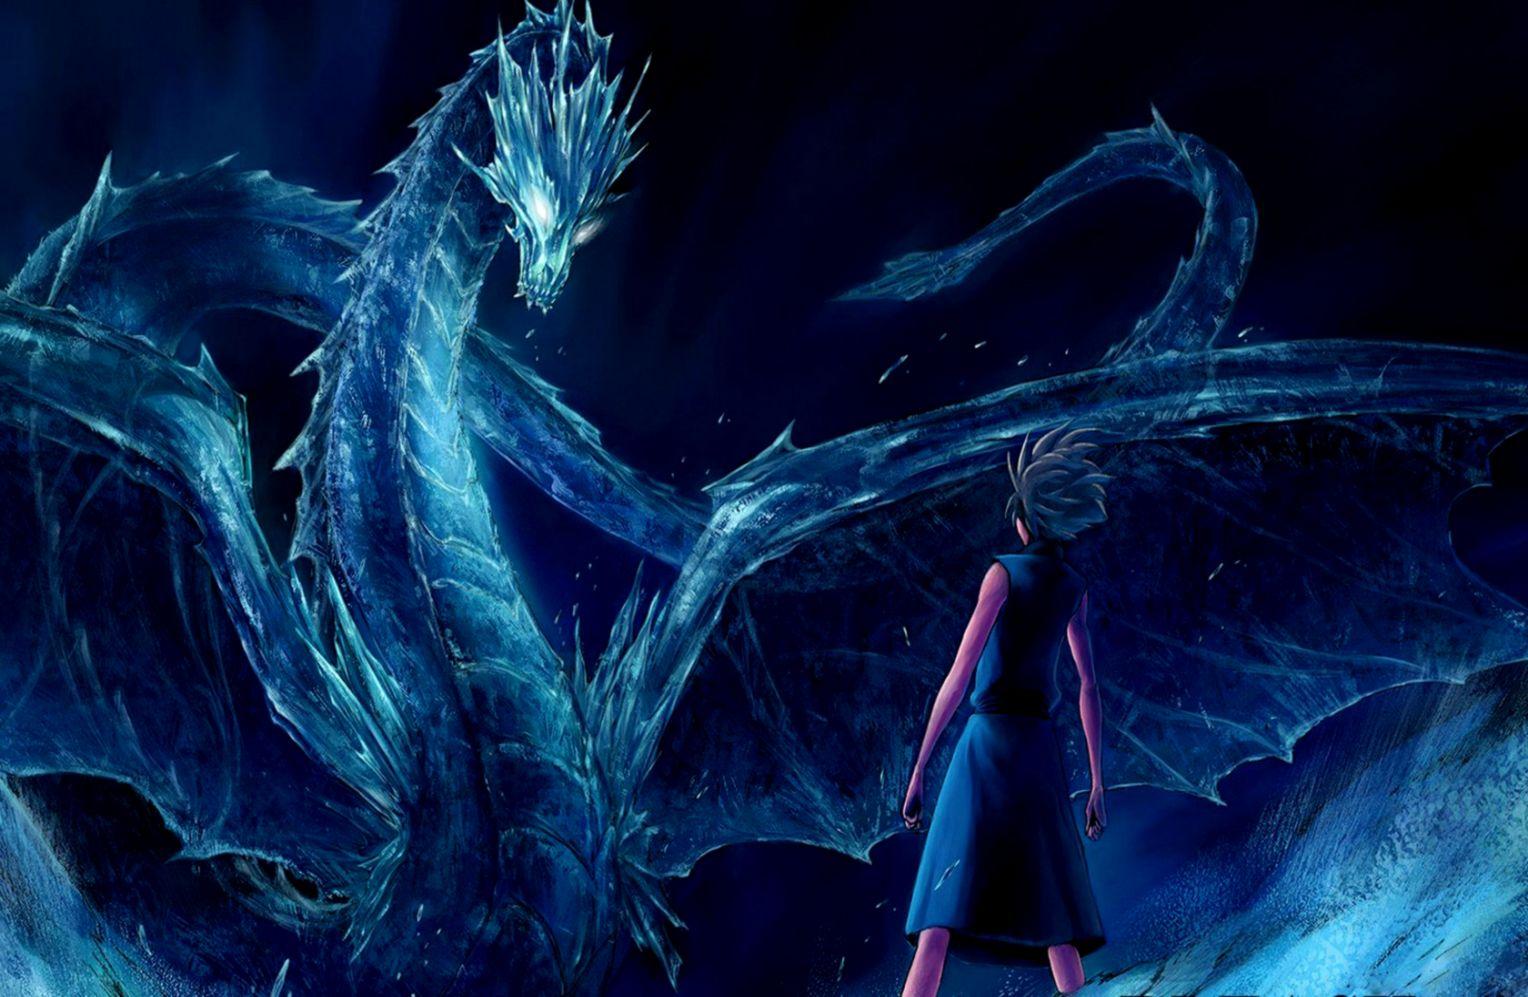 Dreamy Fantasy Outer Space Dragon Creative Wallpaper